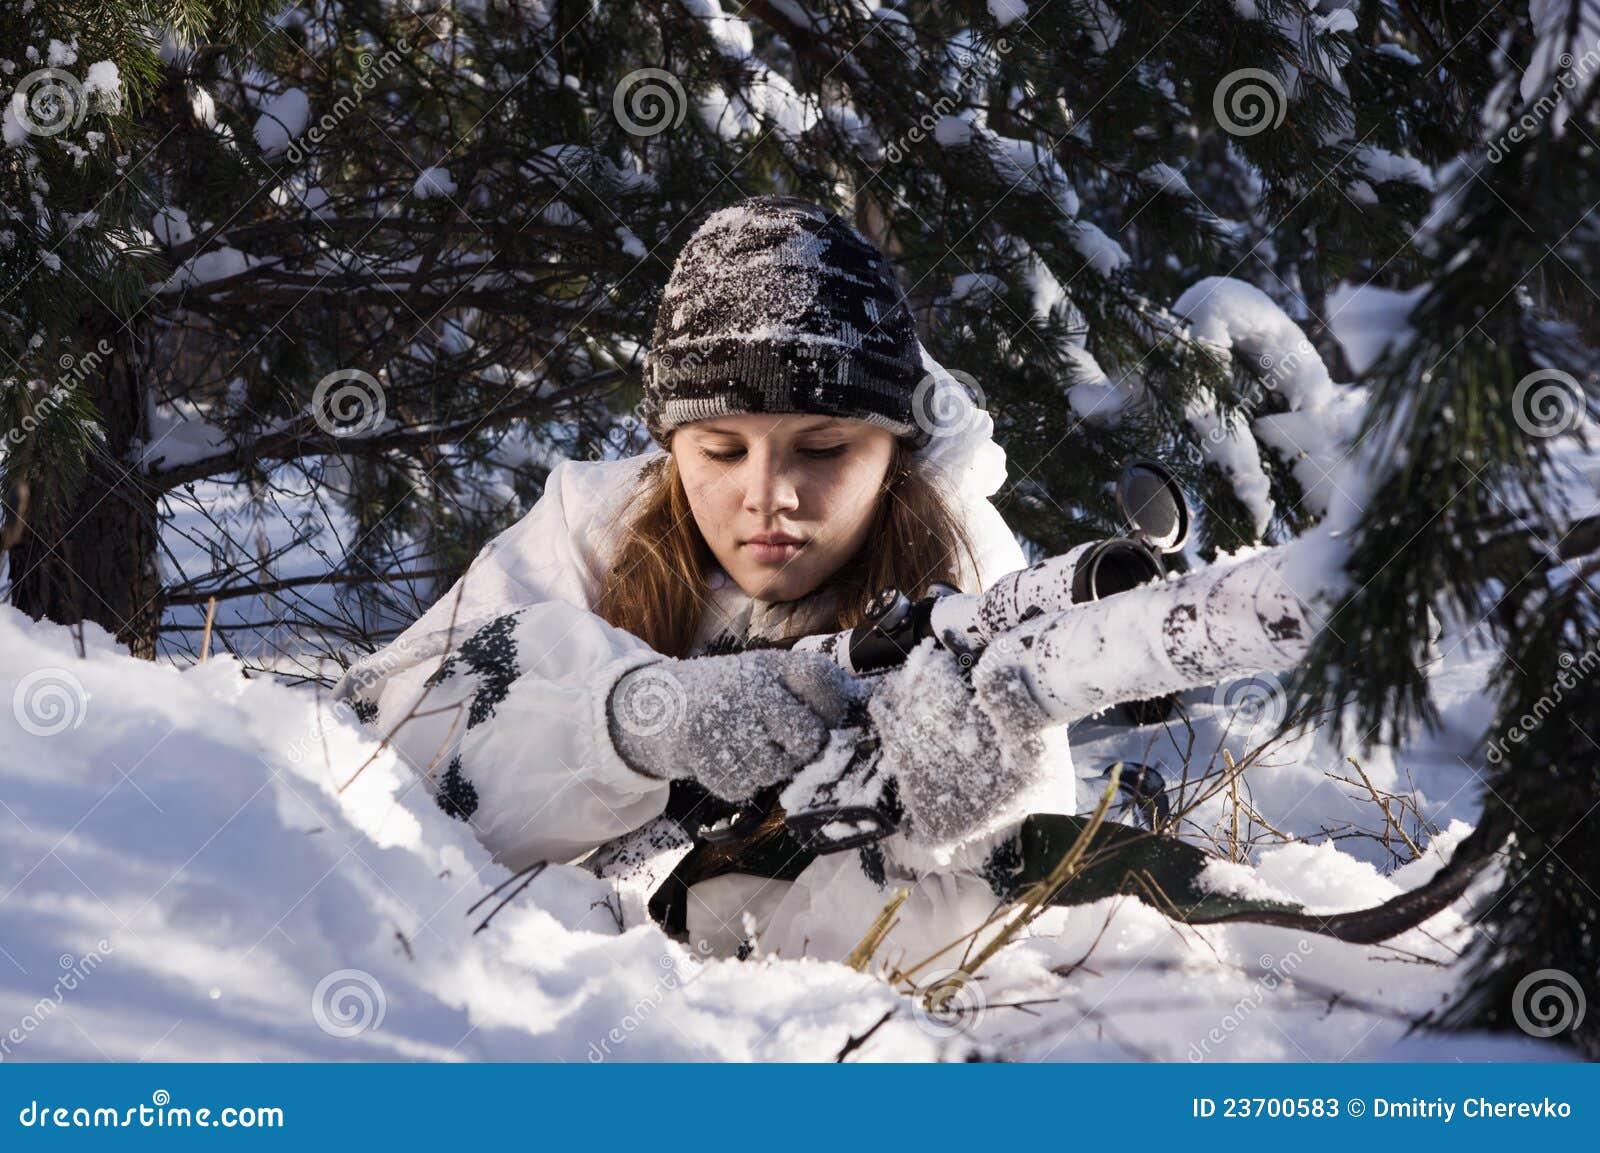 Sniper Girl Stock Photos - Image: 23700583